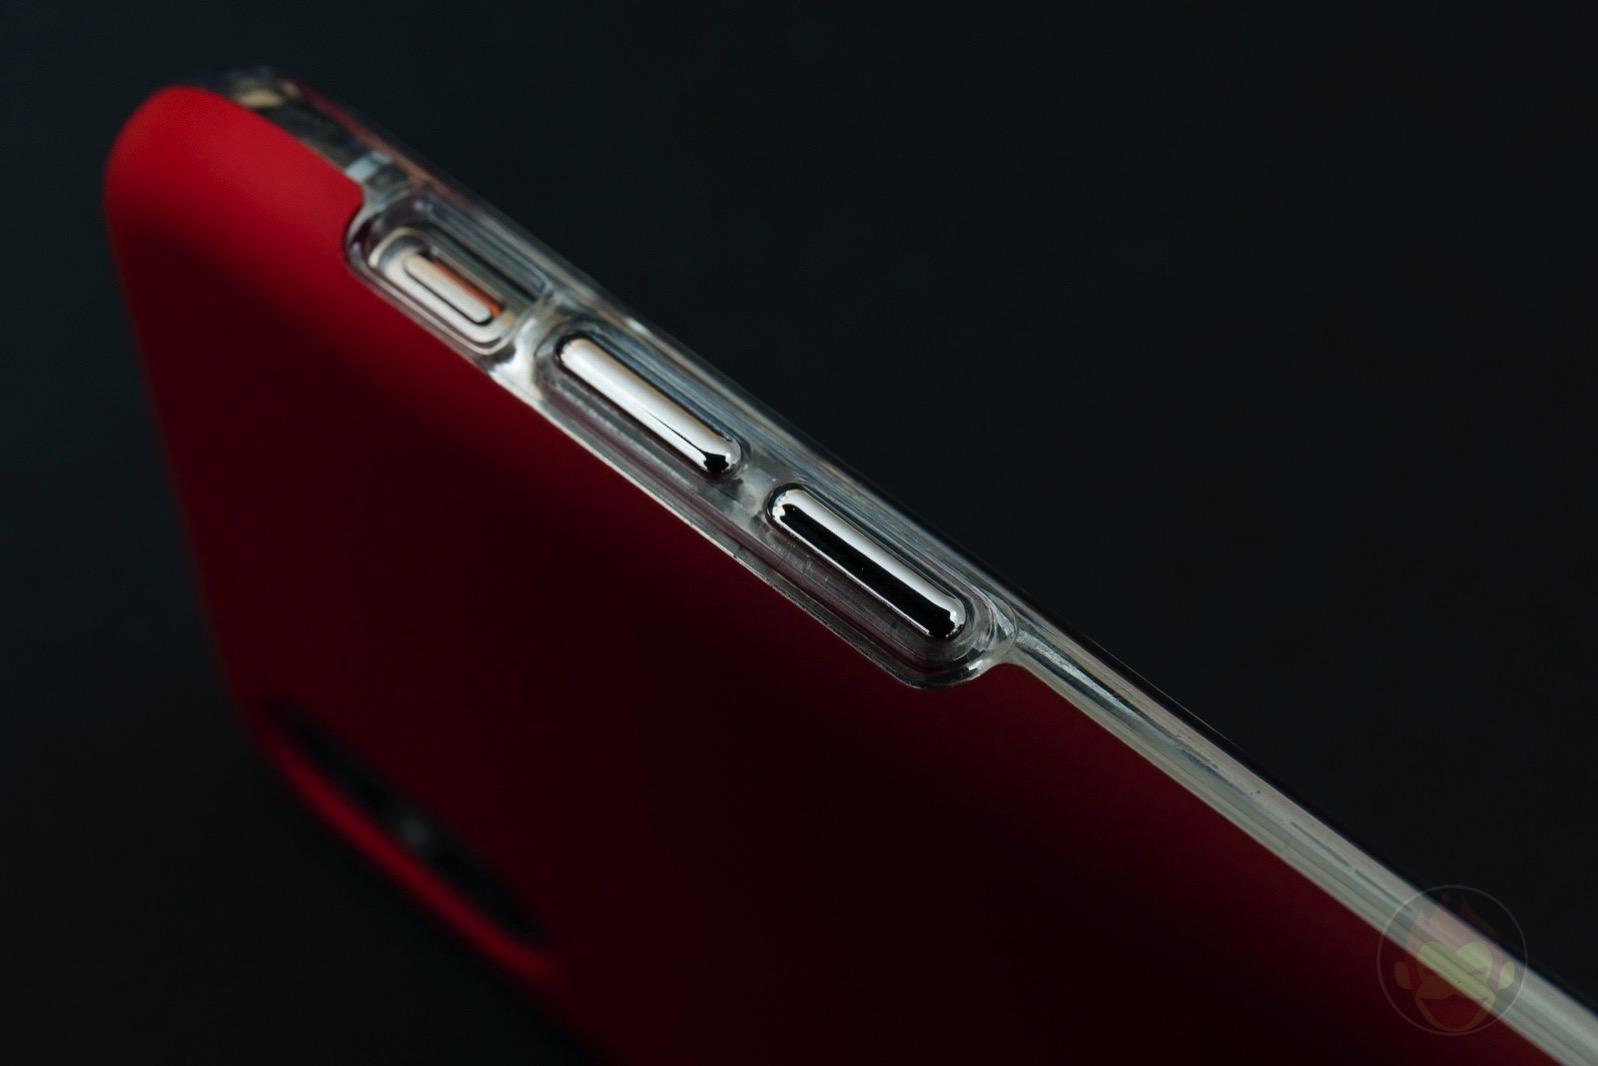 PhoneFoam-Dual-Skin-iPhoneX-Case-09.jpg